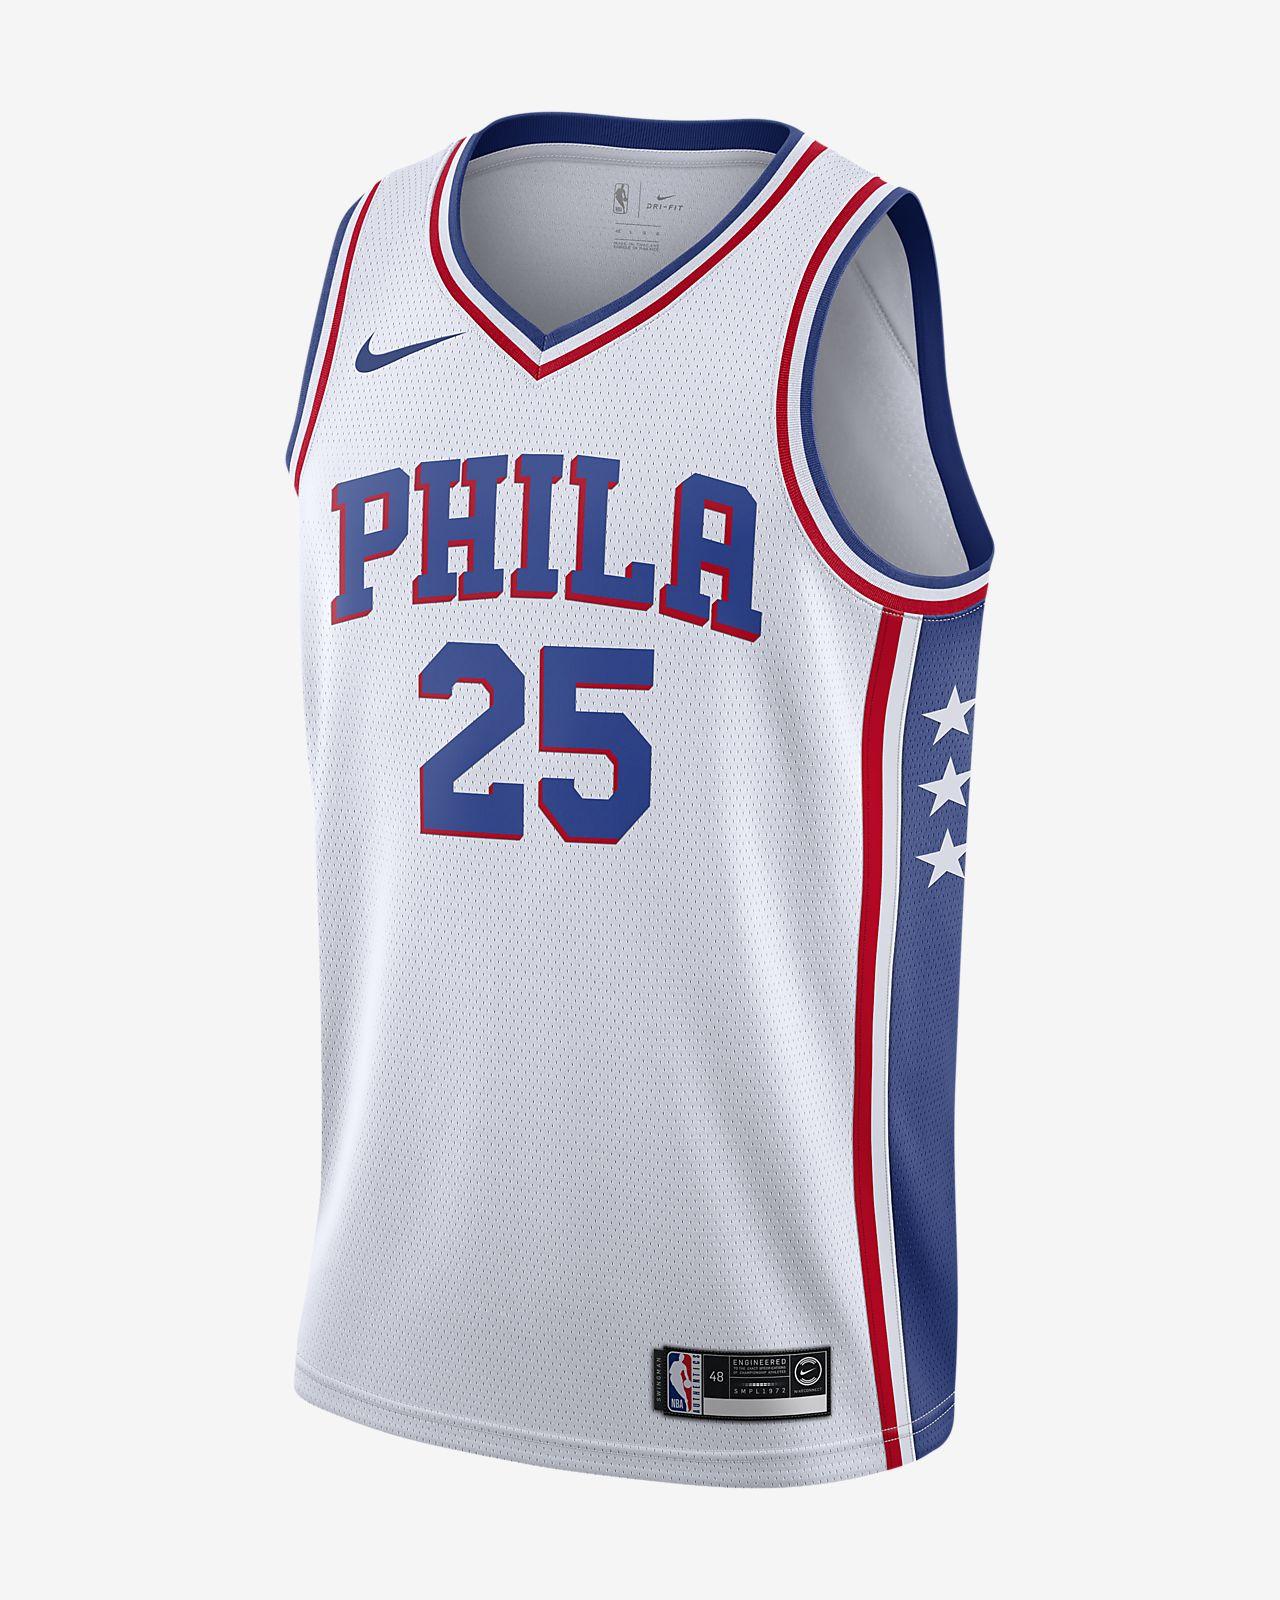 Джерси Nike НБА Swingman Ben Simmons 76ers Association Edition